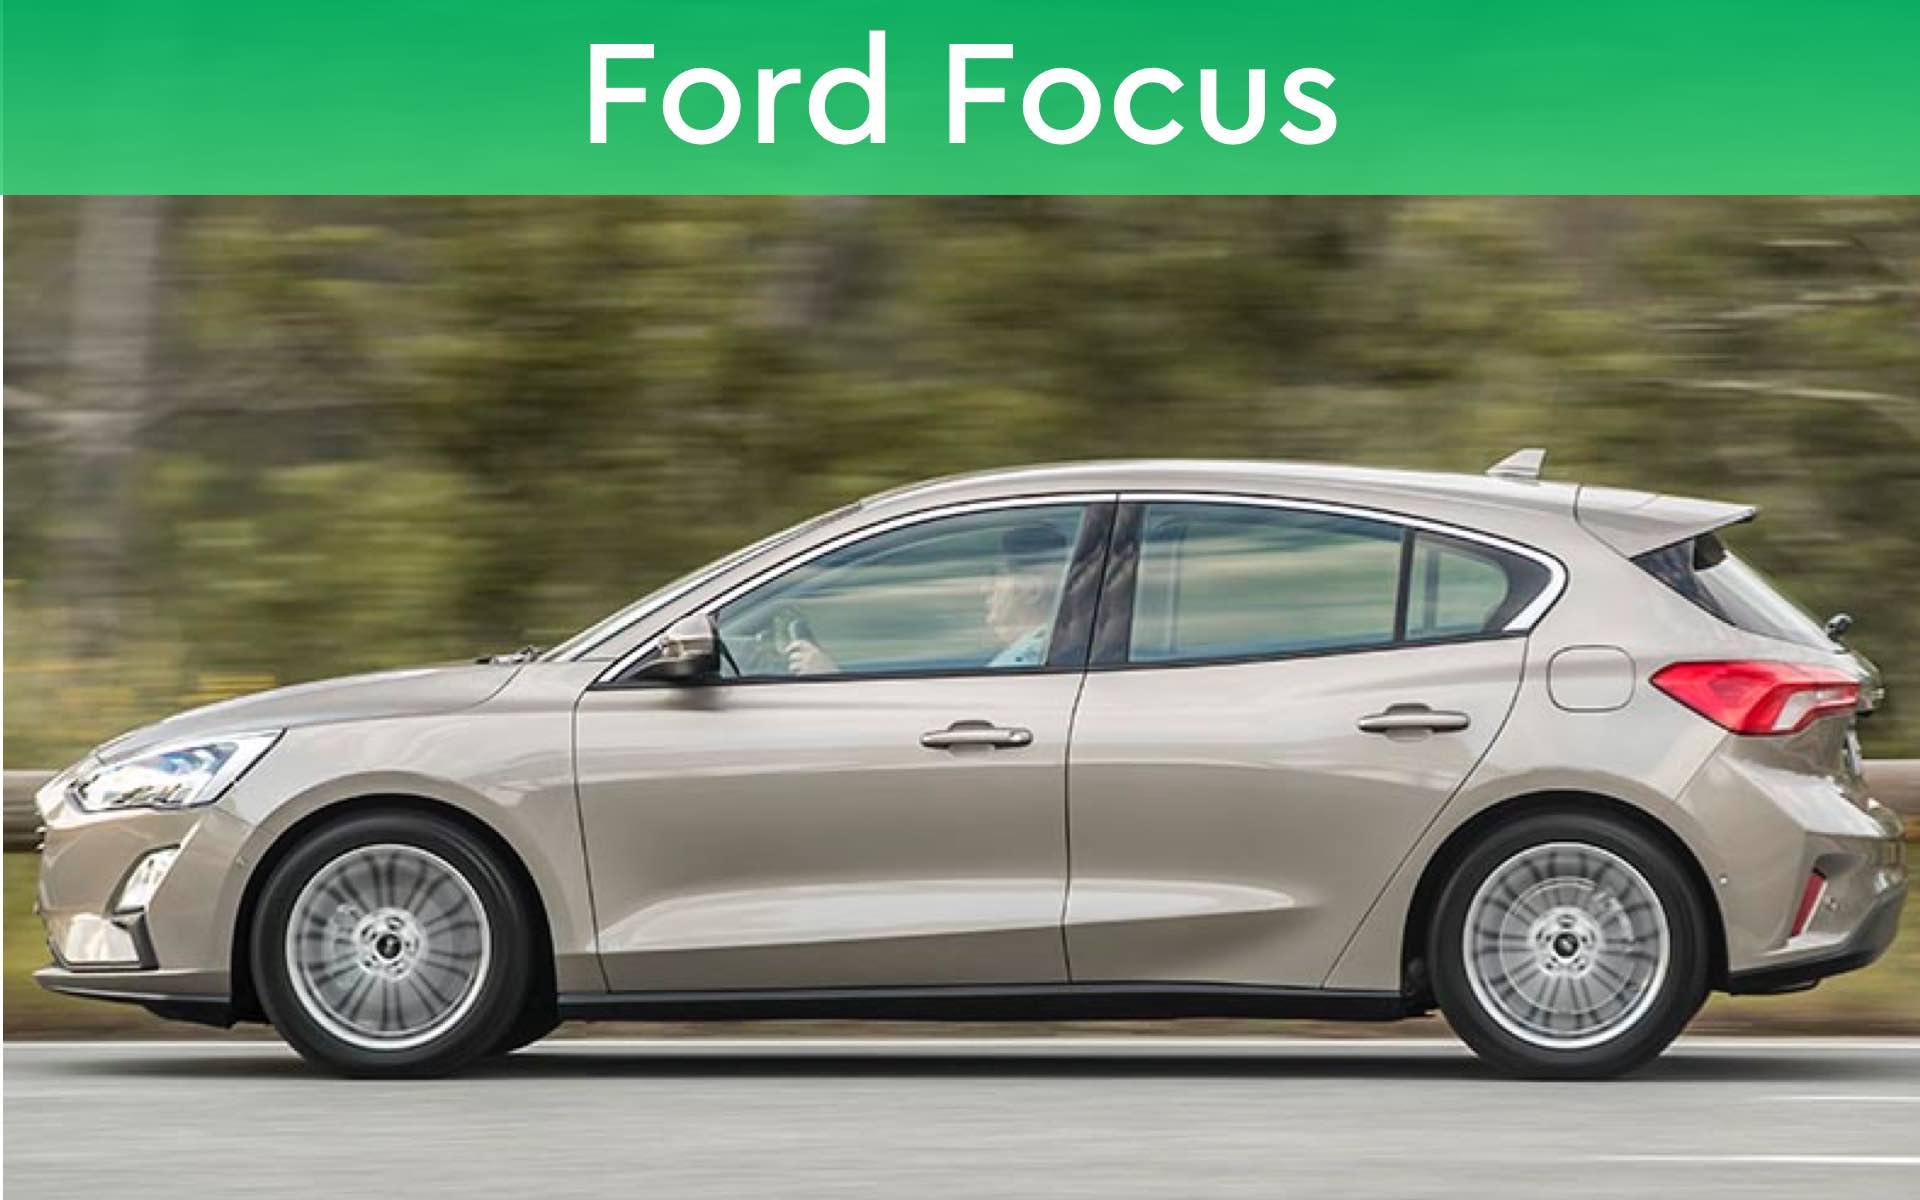 Ford Focus Private Lease Aanbiedingen en reviews